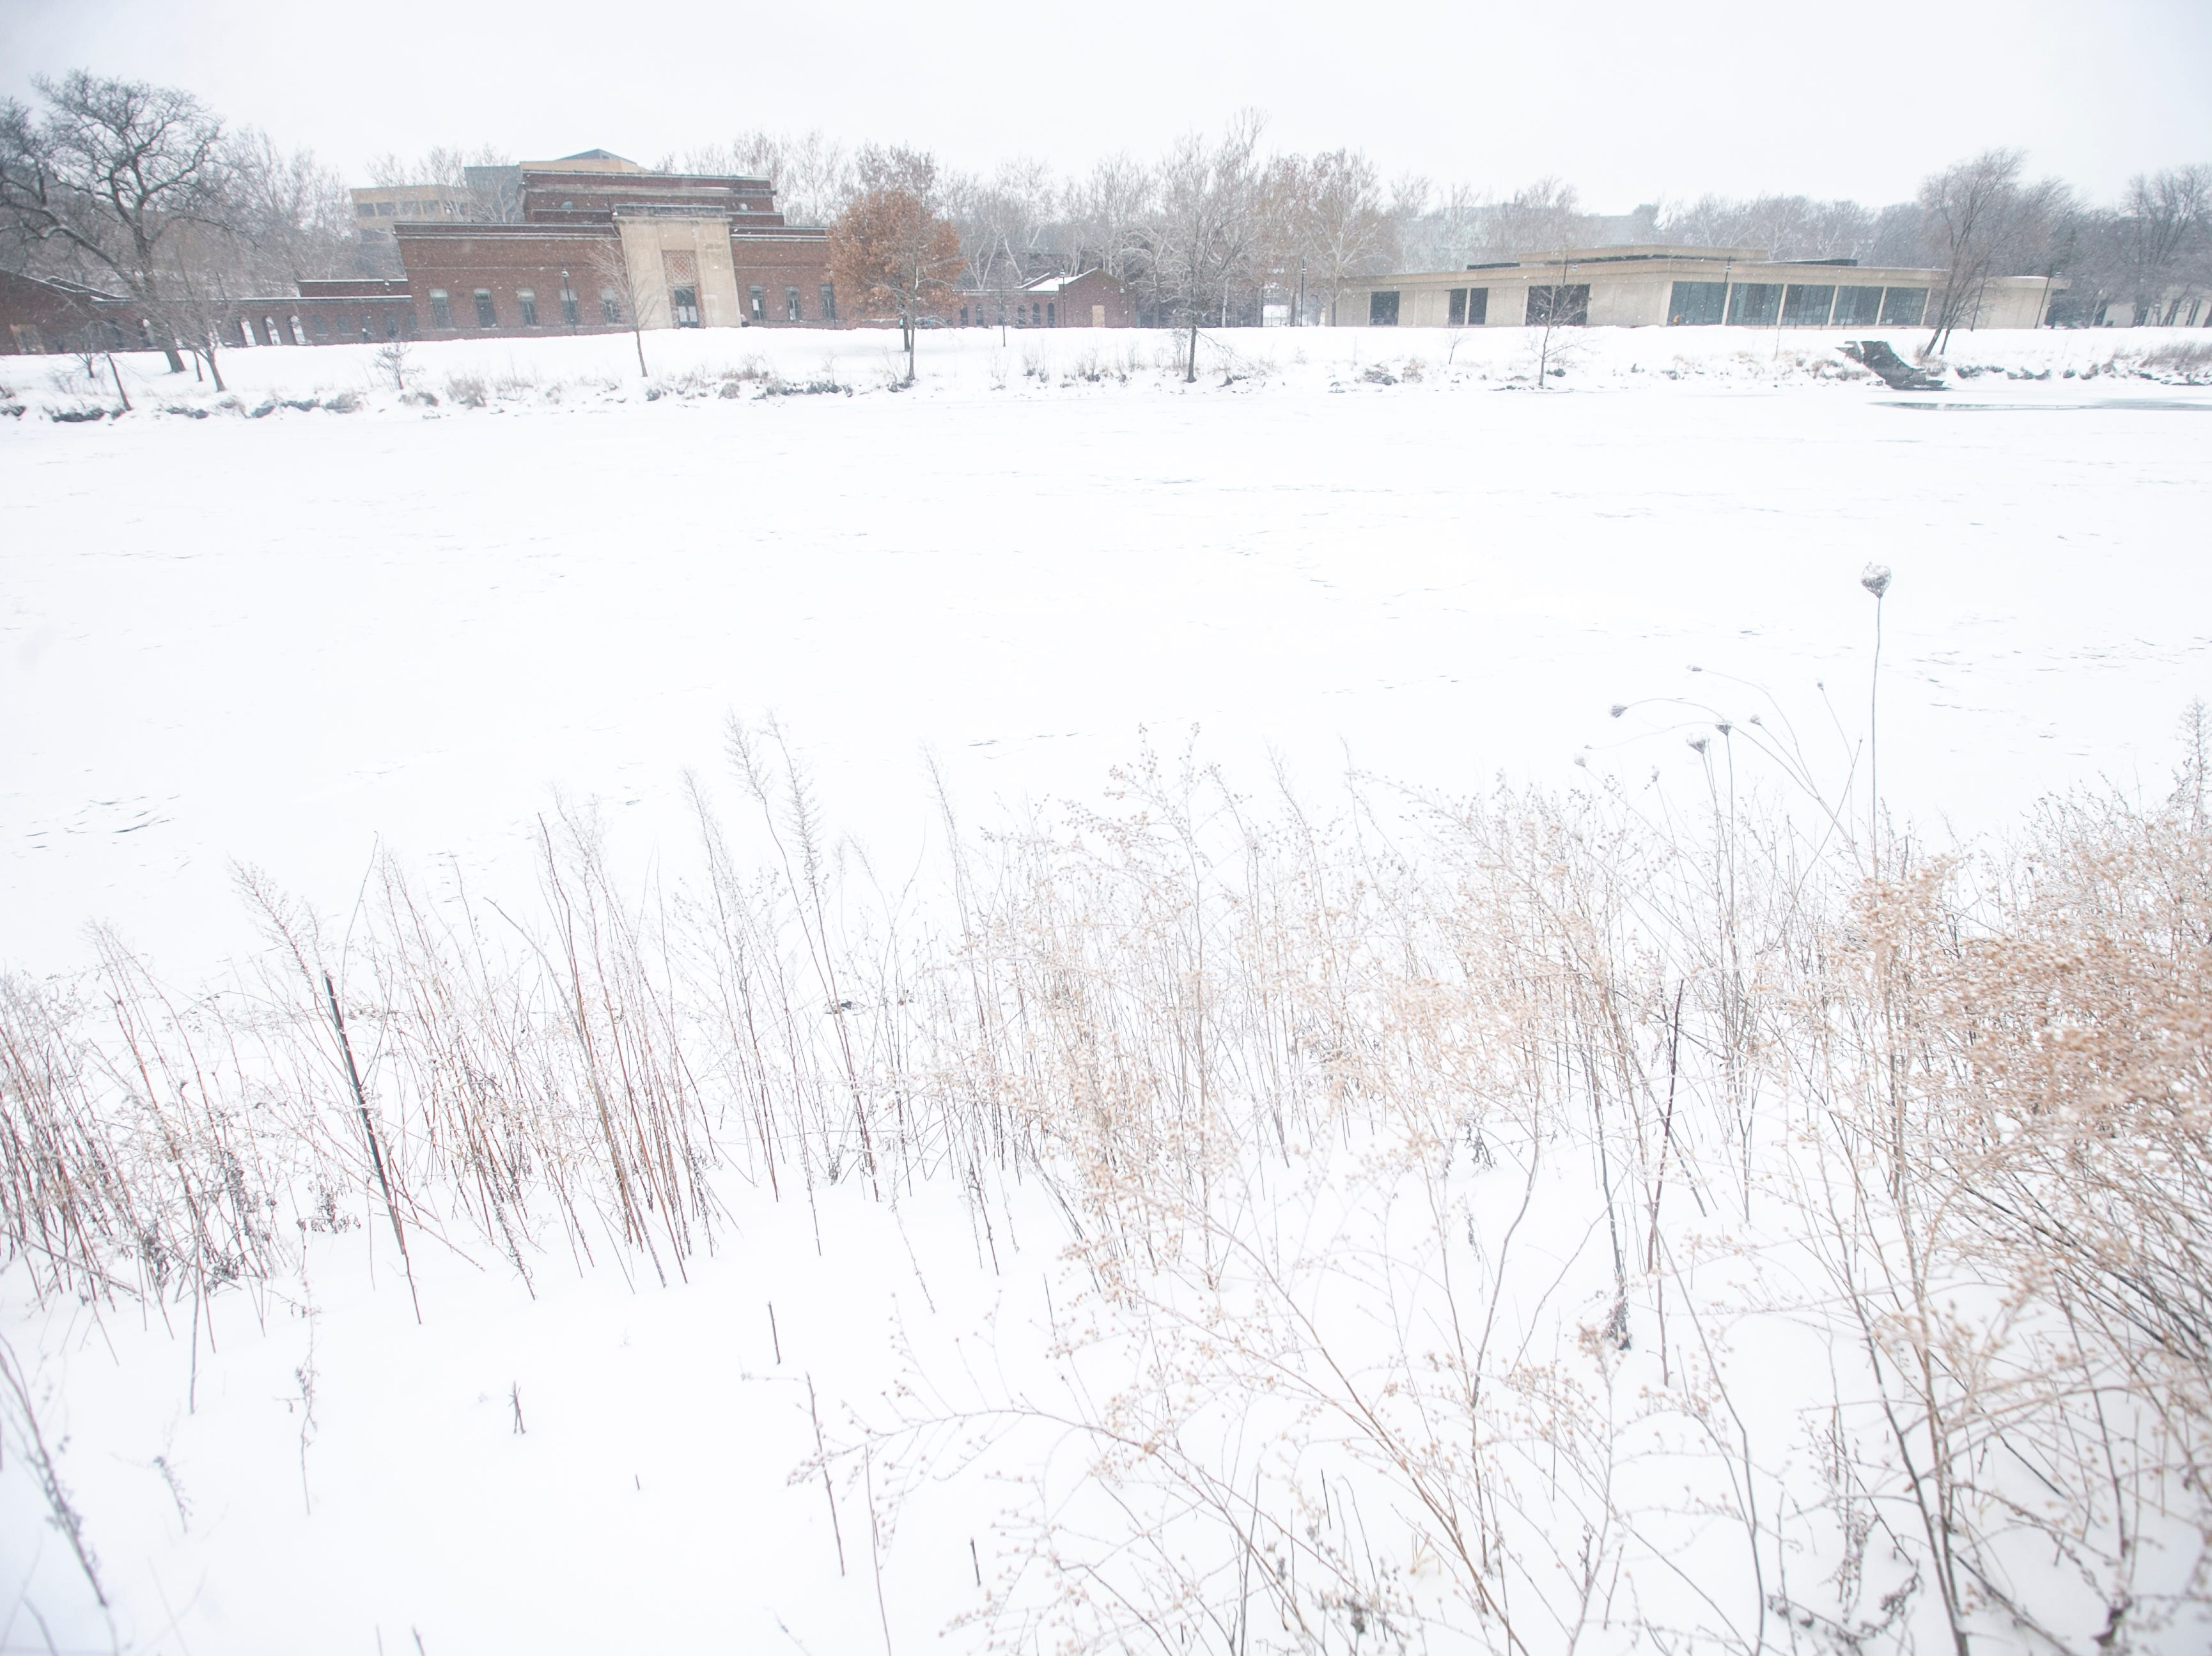 Snow blankets the partially frozen Iowa River on Tuesday, Jan. 22, 2019, in Iowa City, Iowa.